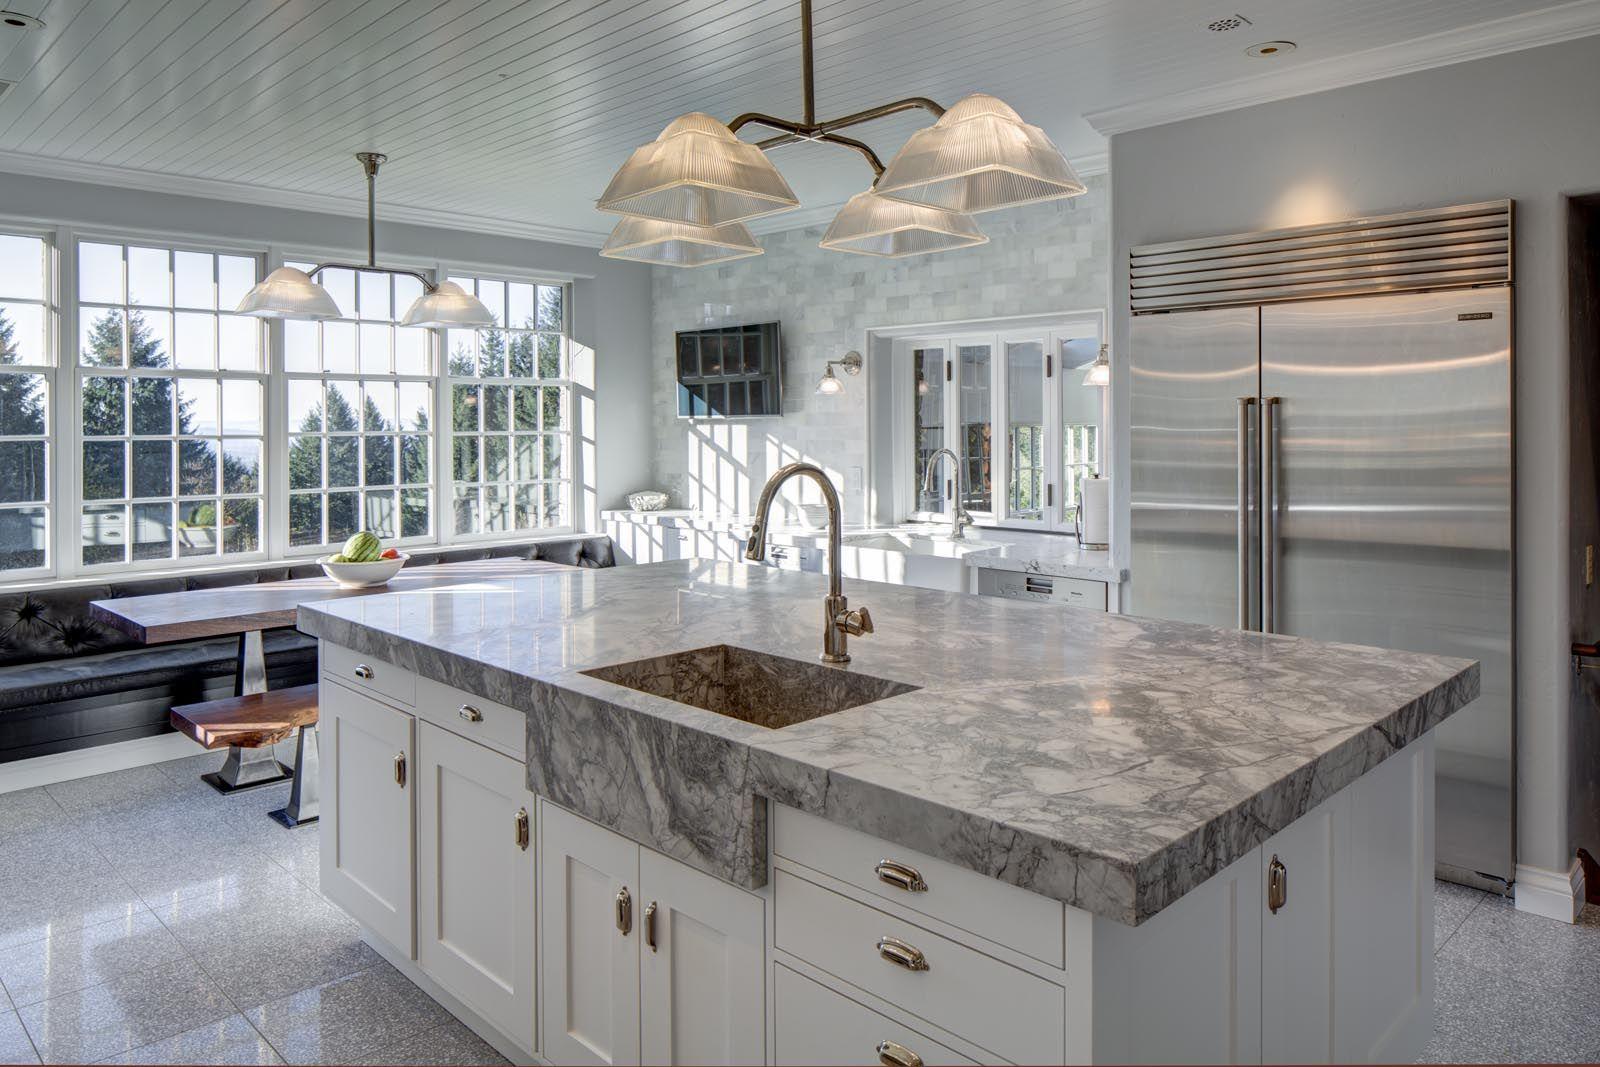 Kitchen Island in Portland Home Remodel | Hammer & Hand